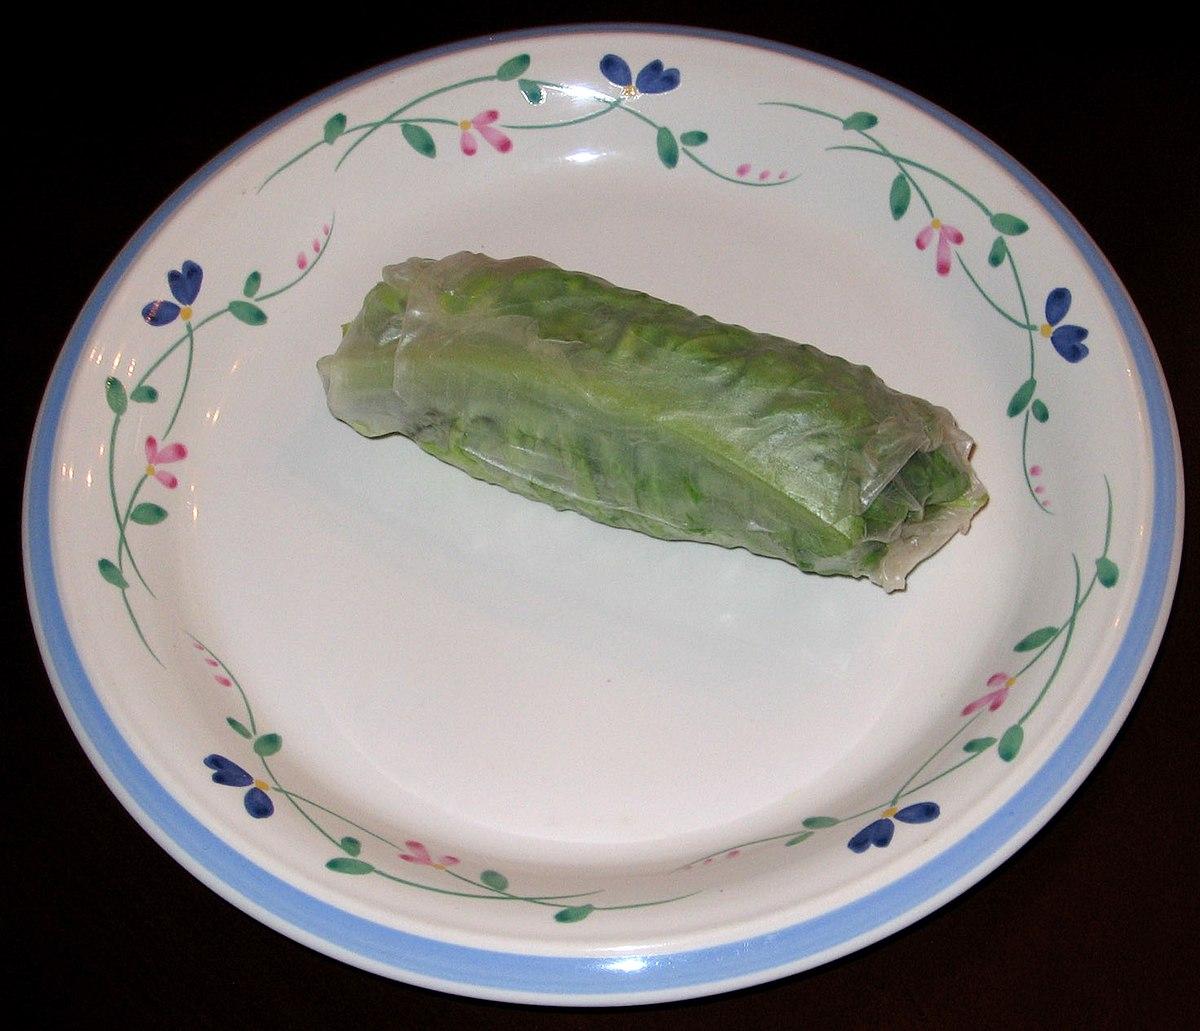 Rouleau de printemps wikip dia for The east asian dining t nagar